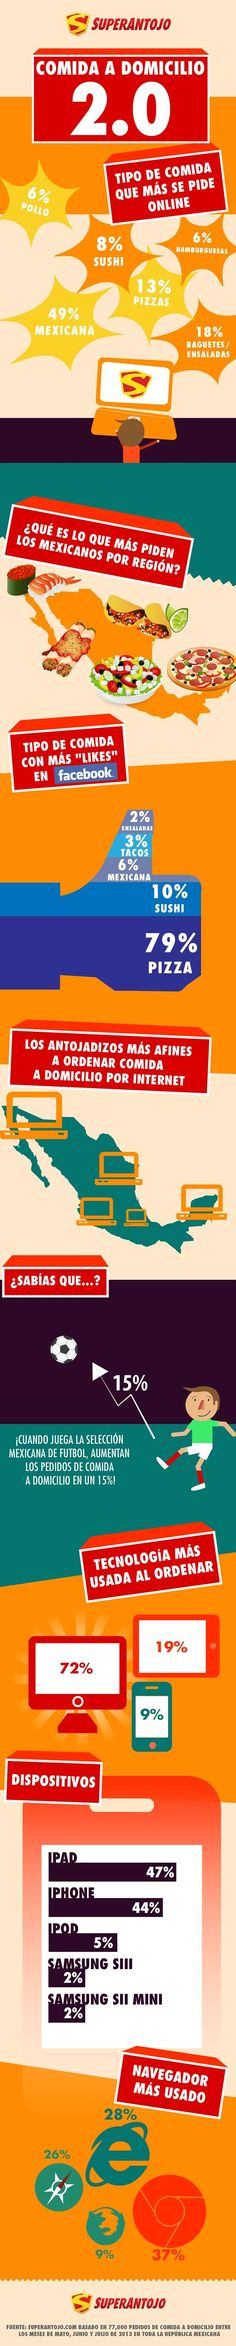 Comida a domicilio 2.0 (México)